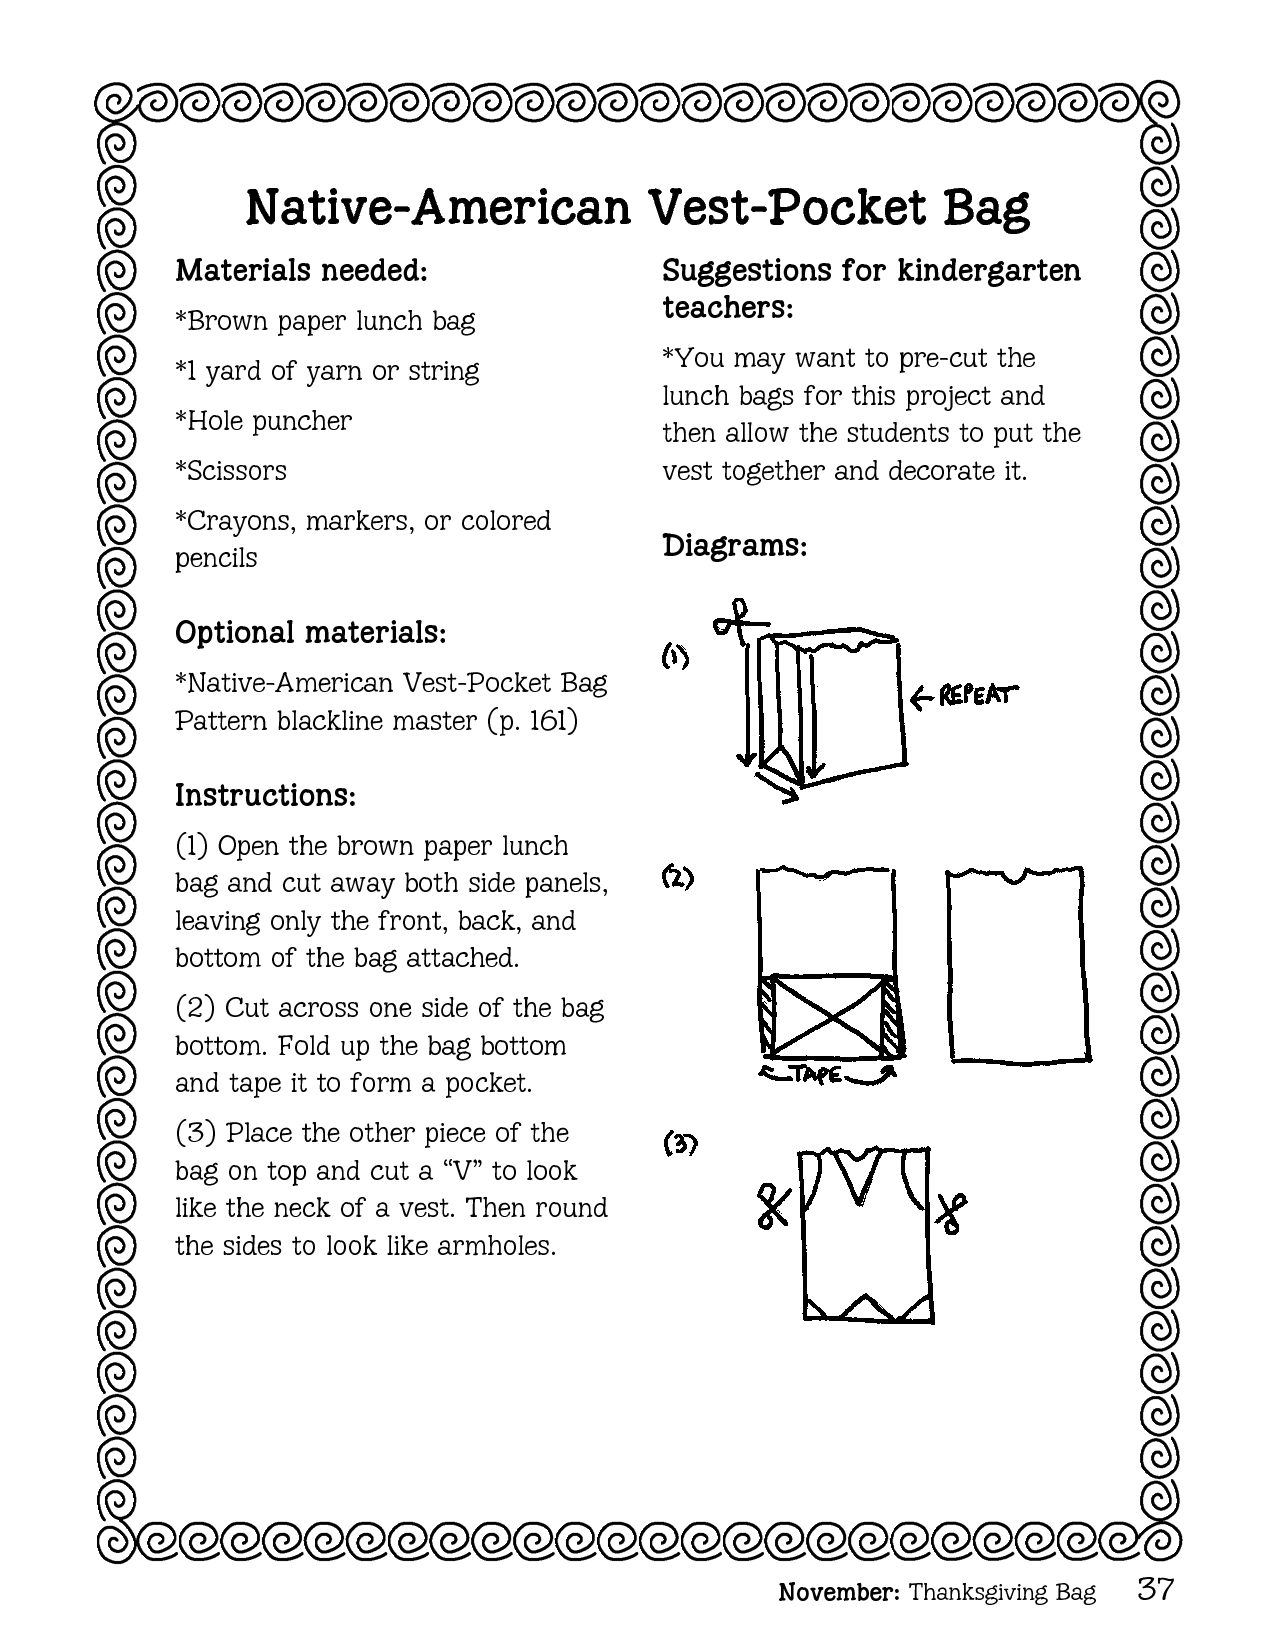 Lunch bag template native american vest pocket bag materials lunch bag template native american vest pocket bag materials needed brown paper lunch jeuxipadfo Gallery